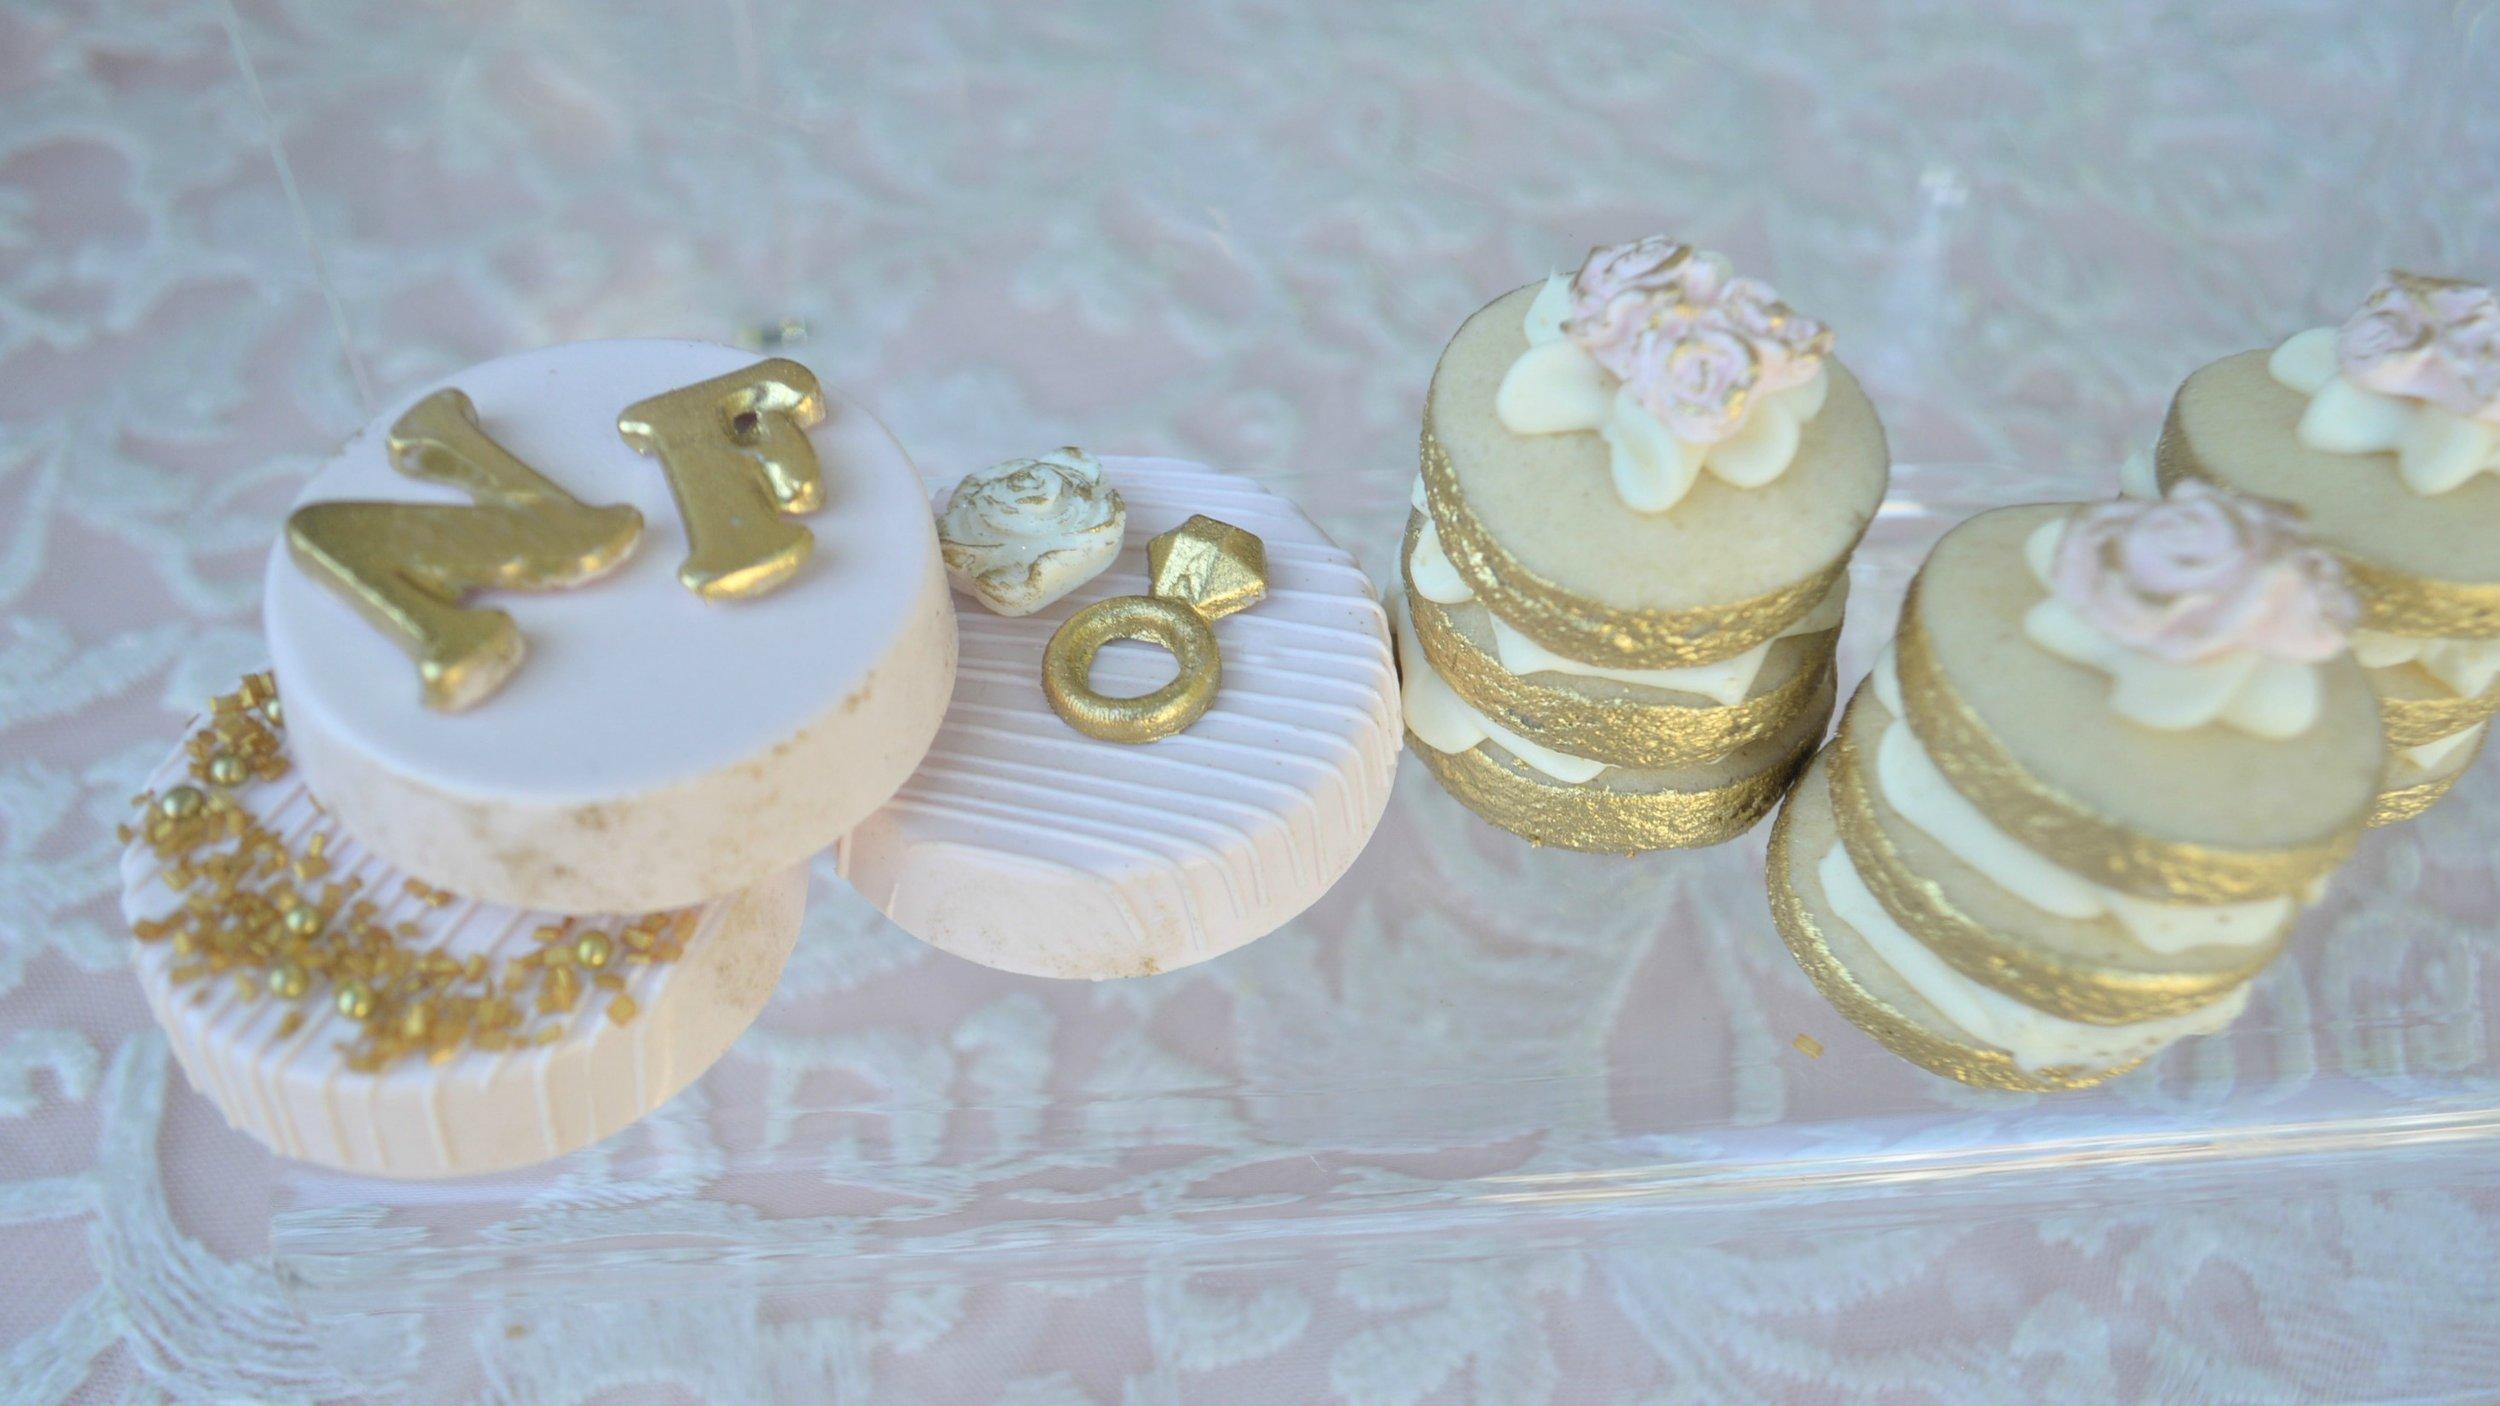 Wedding Dessert Ideas-Wedding-Garden Wedding-Blush Pink and Gold Wedding-Dessert Ideas-www.SugarPartiesLA.com.jpg